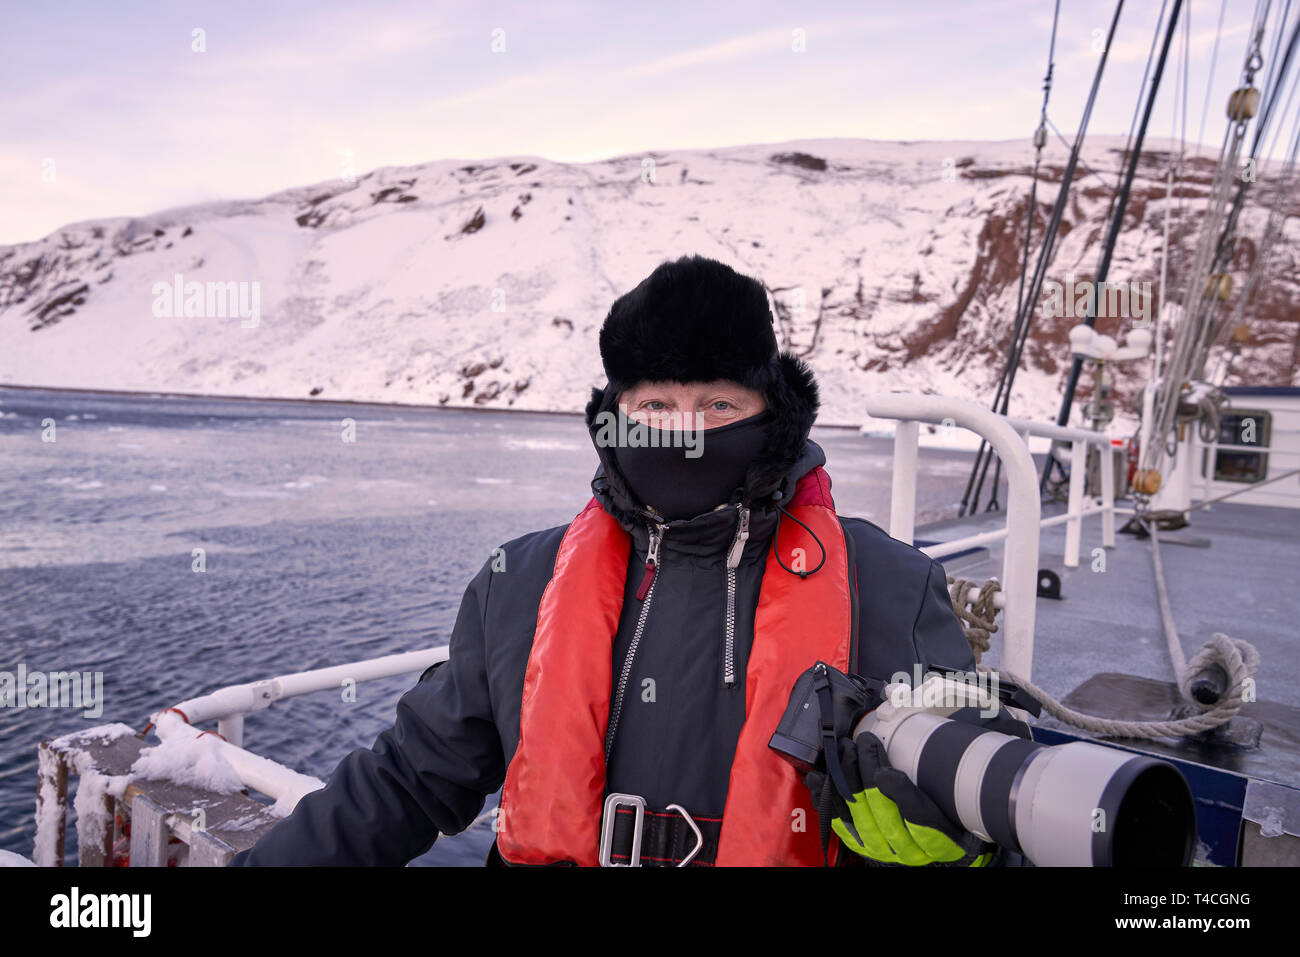 Photographer on the Rembrant Van Rijn, Schooner Ship, Scoresbysund, Greenland - Stock Image